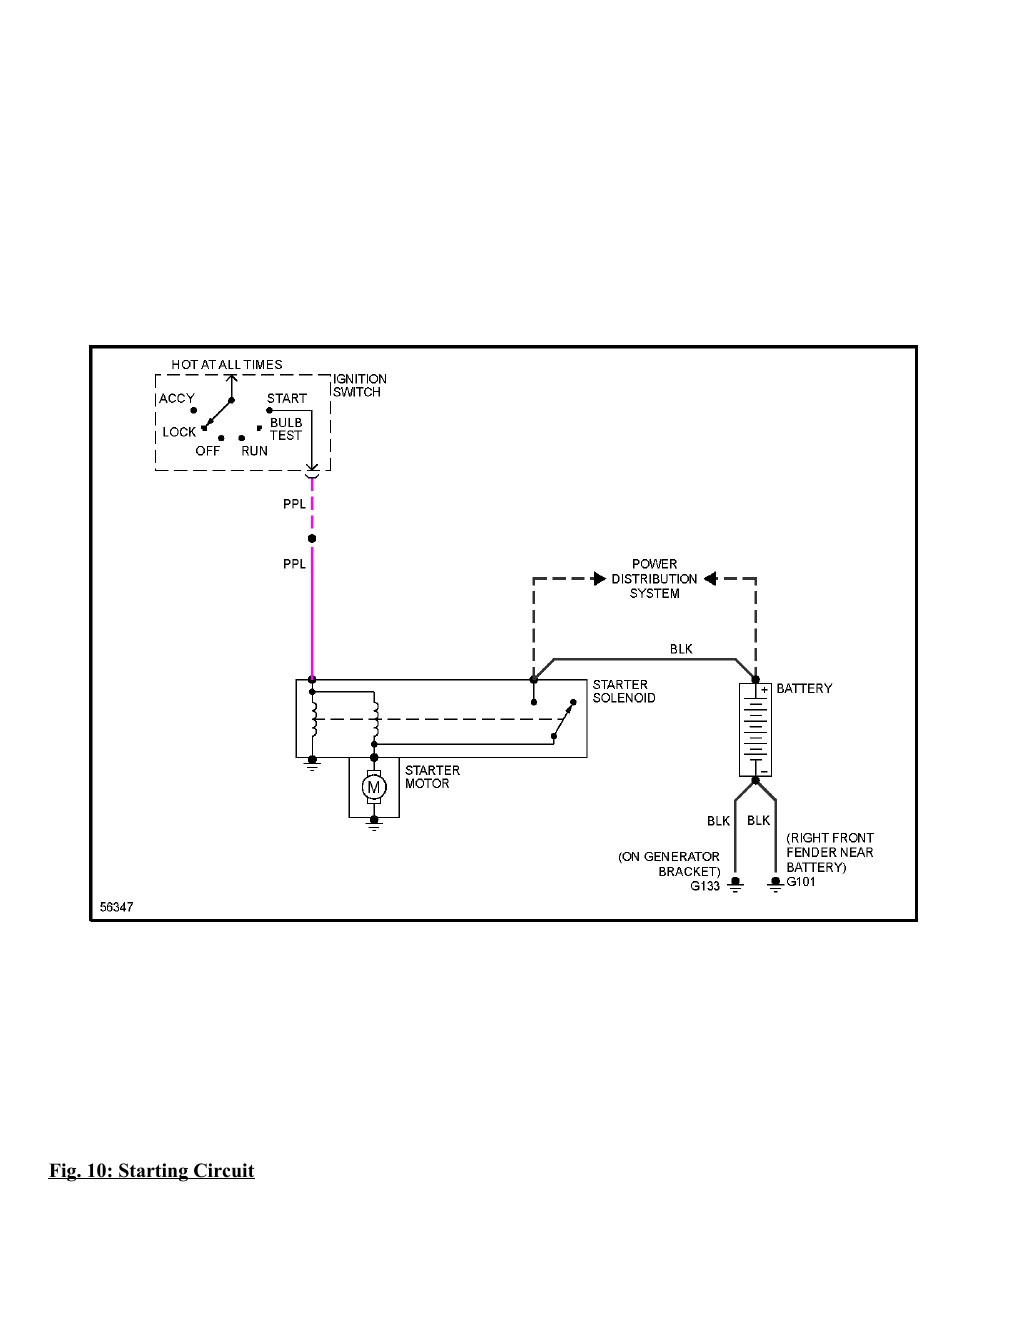 hight resolution of 2001 monte carlo wiring diagram also 2000 monte carlo wiring diagram 2001 chevy monte carlo engine